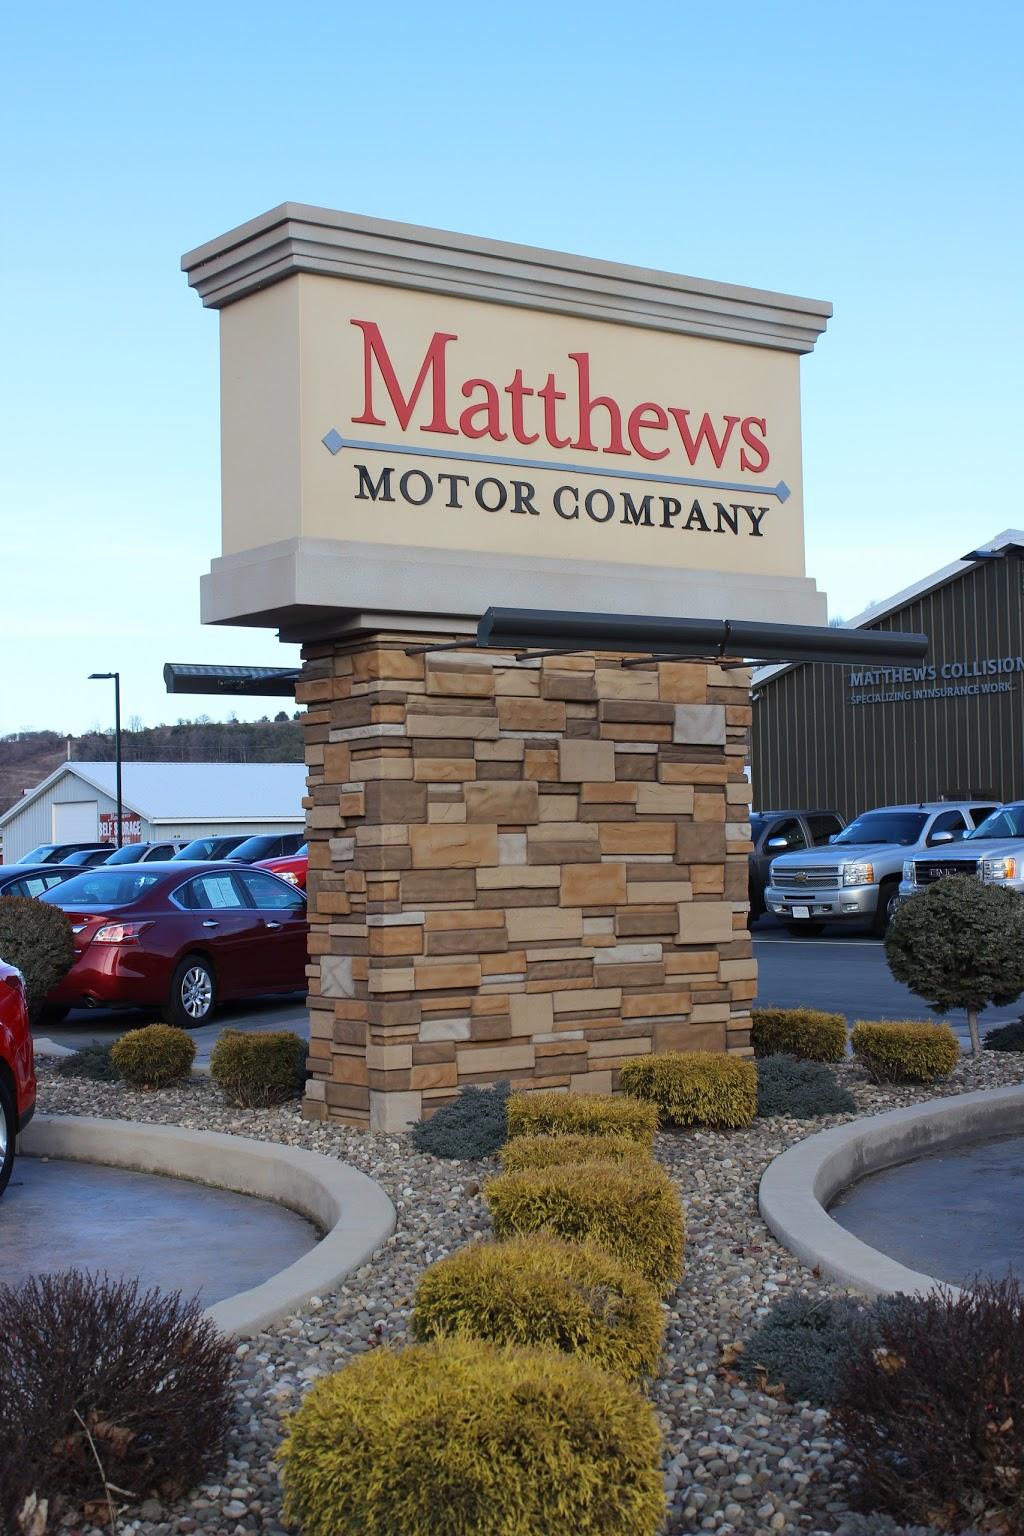 Matthews Car Rentals - car rental  | Photo 3 of 10 | Address: 1856 N Williamson Rd #2, Covington, PA 16917, USA | Phone: (570) 659-5406